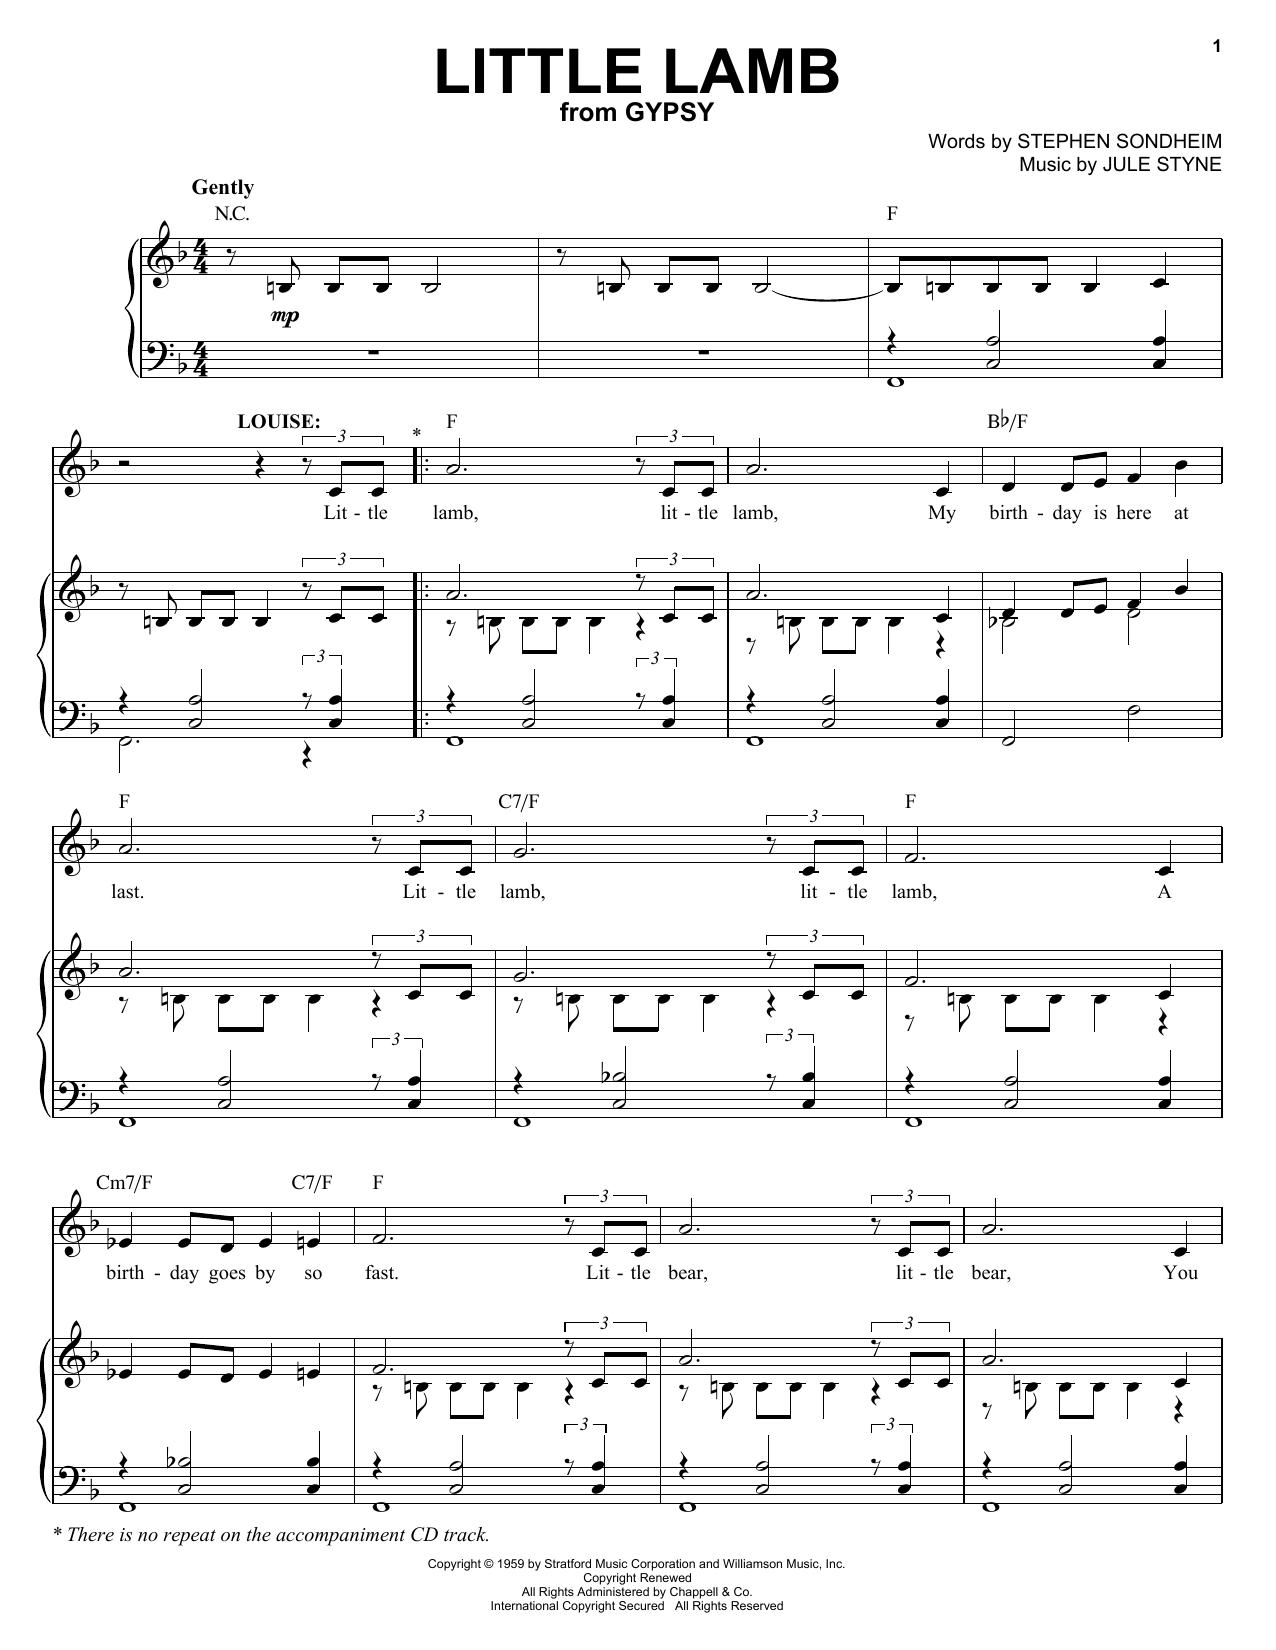 Stephen Sondheim Little Lamb sheet music notes and chords. Download Printable PDF.